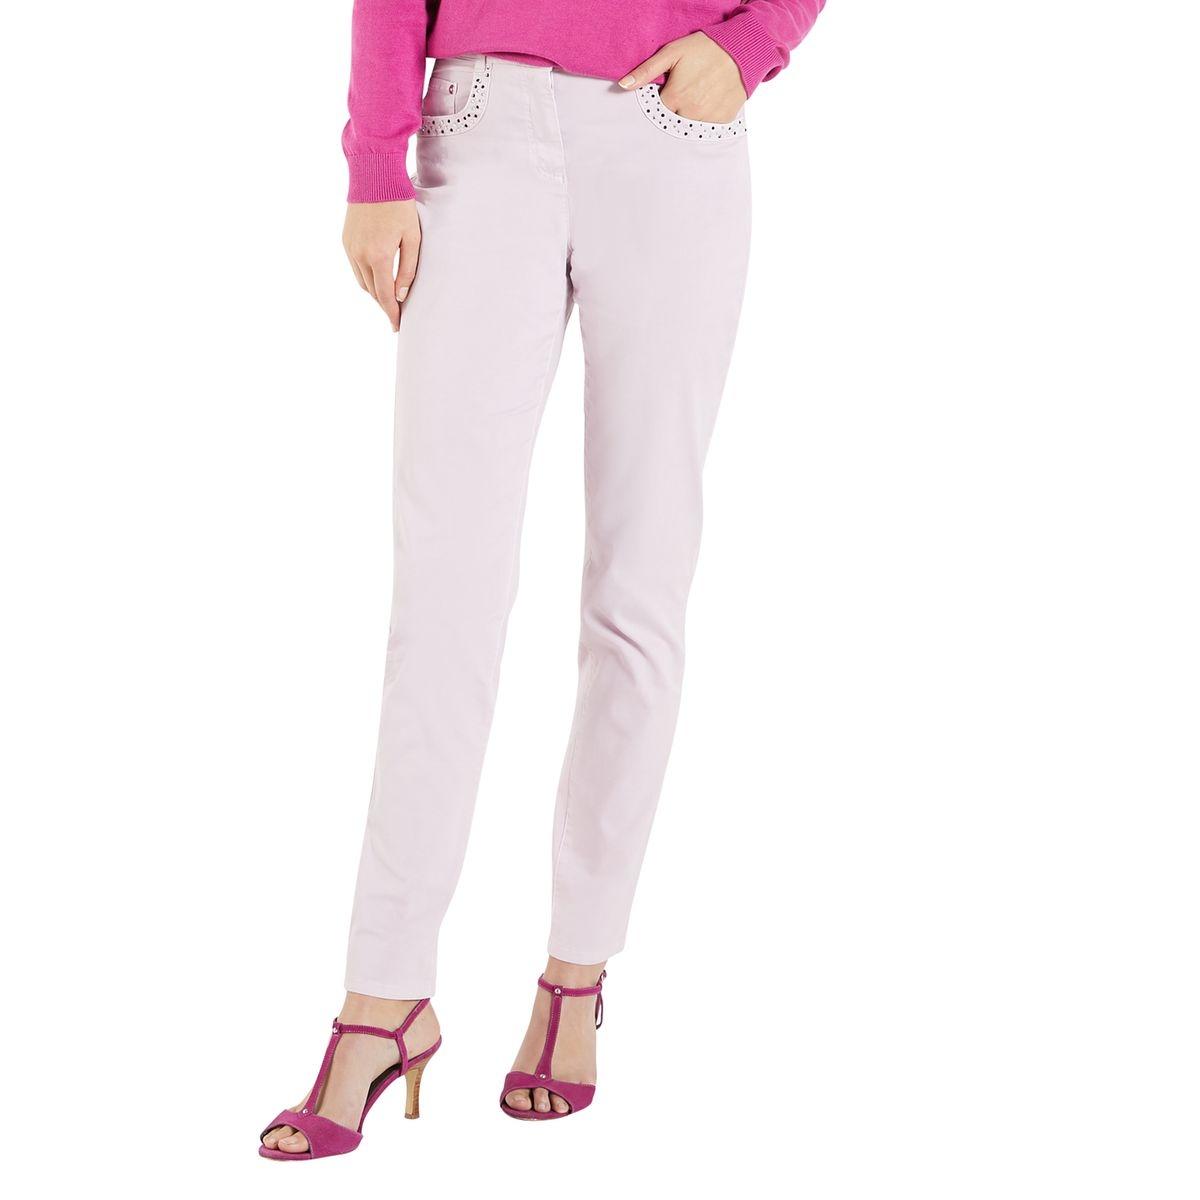 Pantalon 5 poches, strass